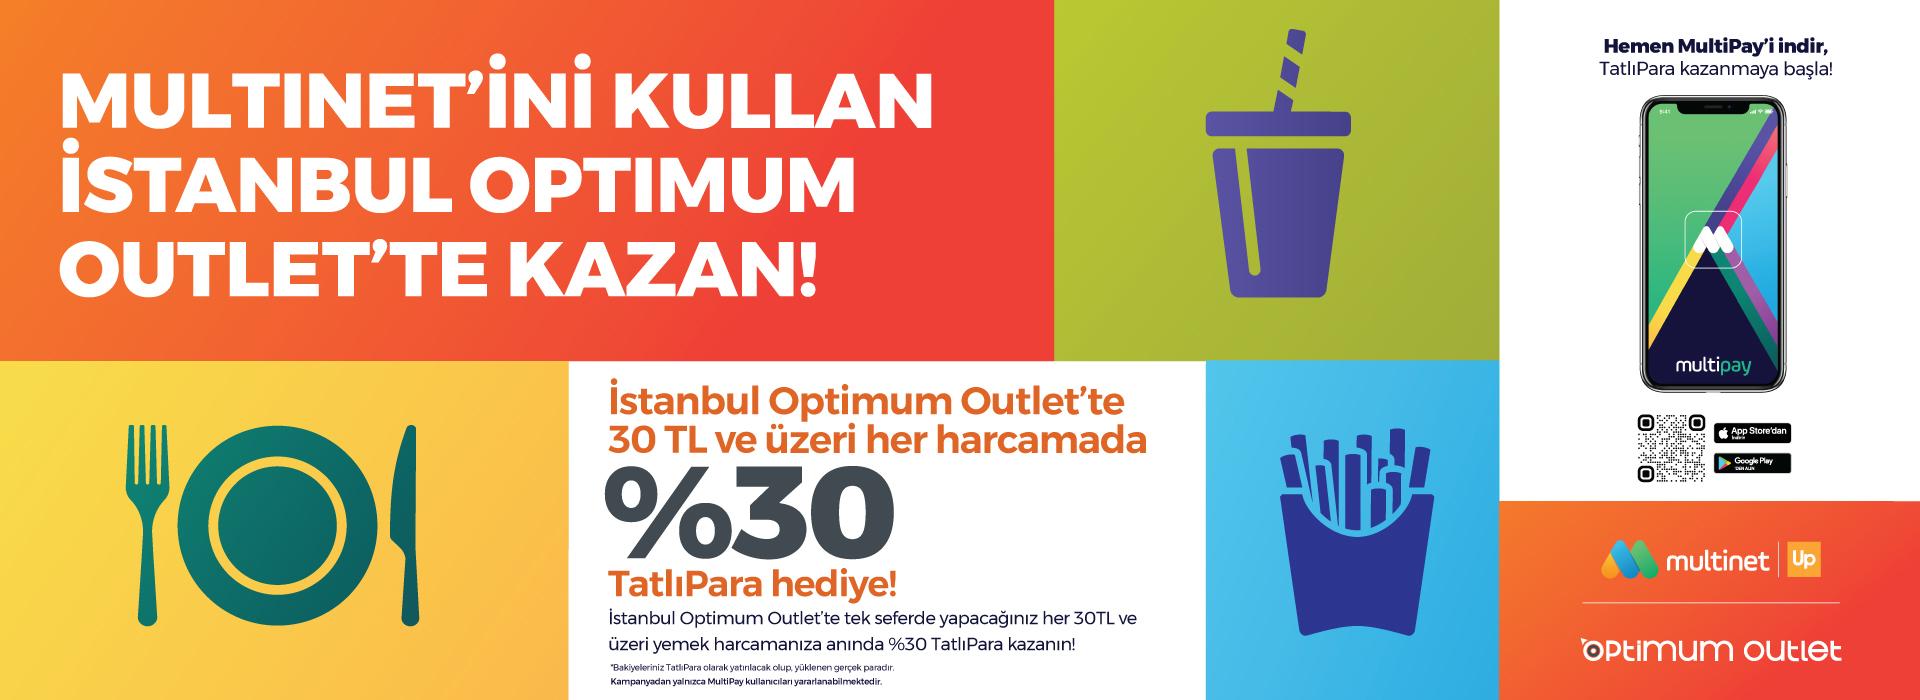 Multinet'ini Kullan İstanbul Optimum Outlet'te Kazan!